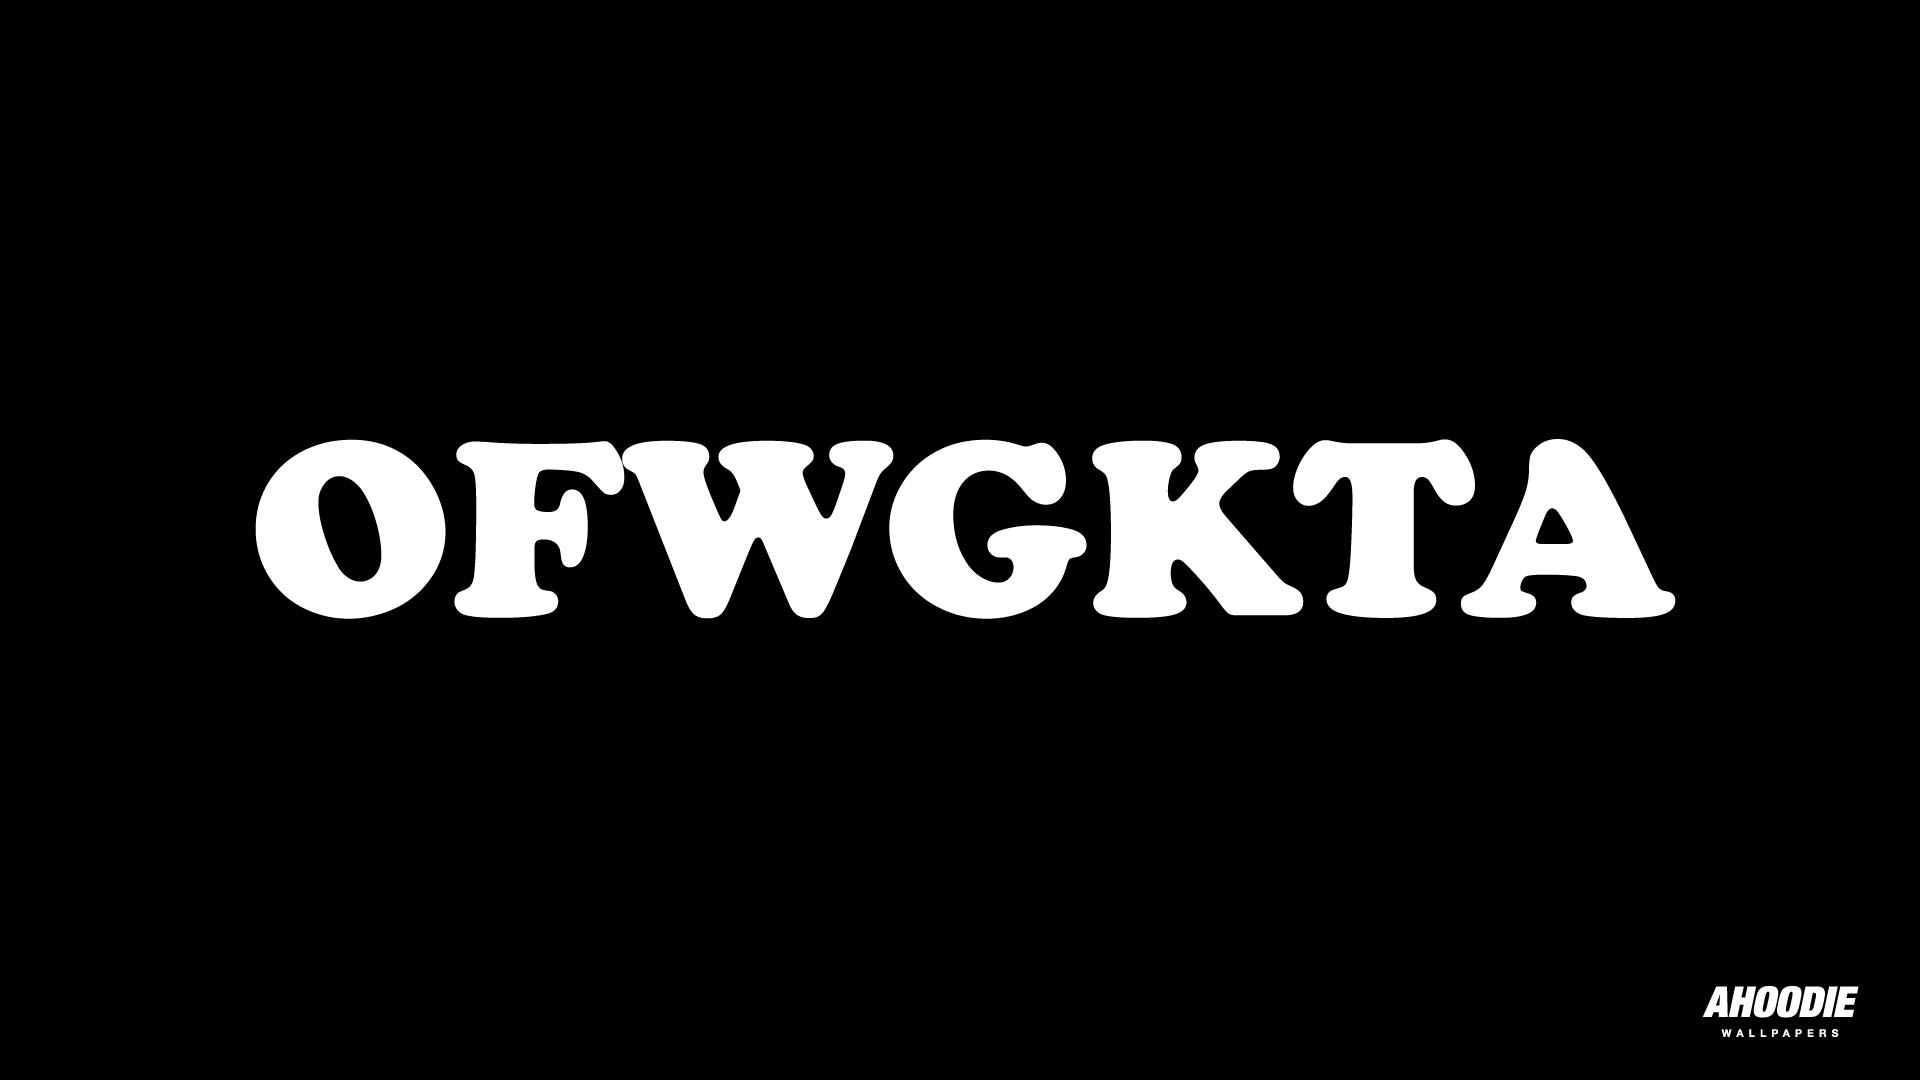 ofwgkta phone wallpaper Nexus 5 Wallpaper 1920x1080 1920x1080